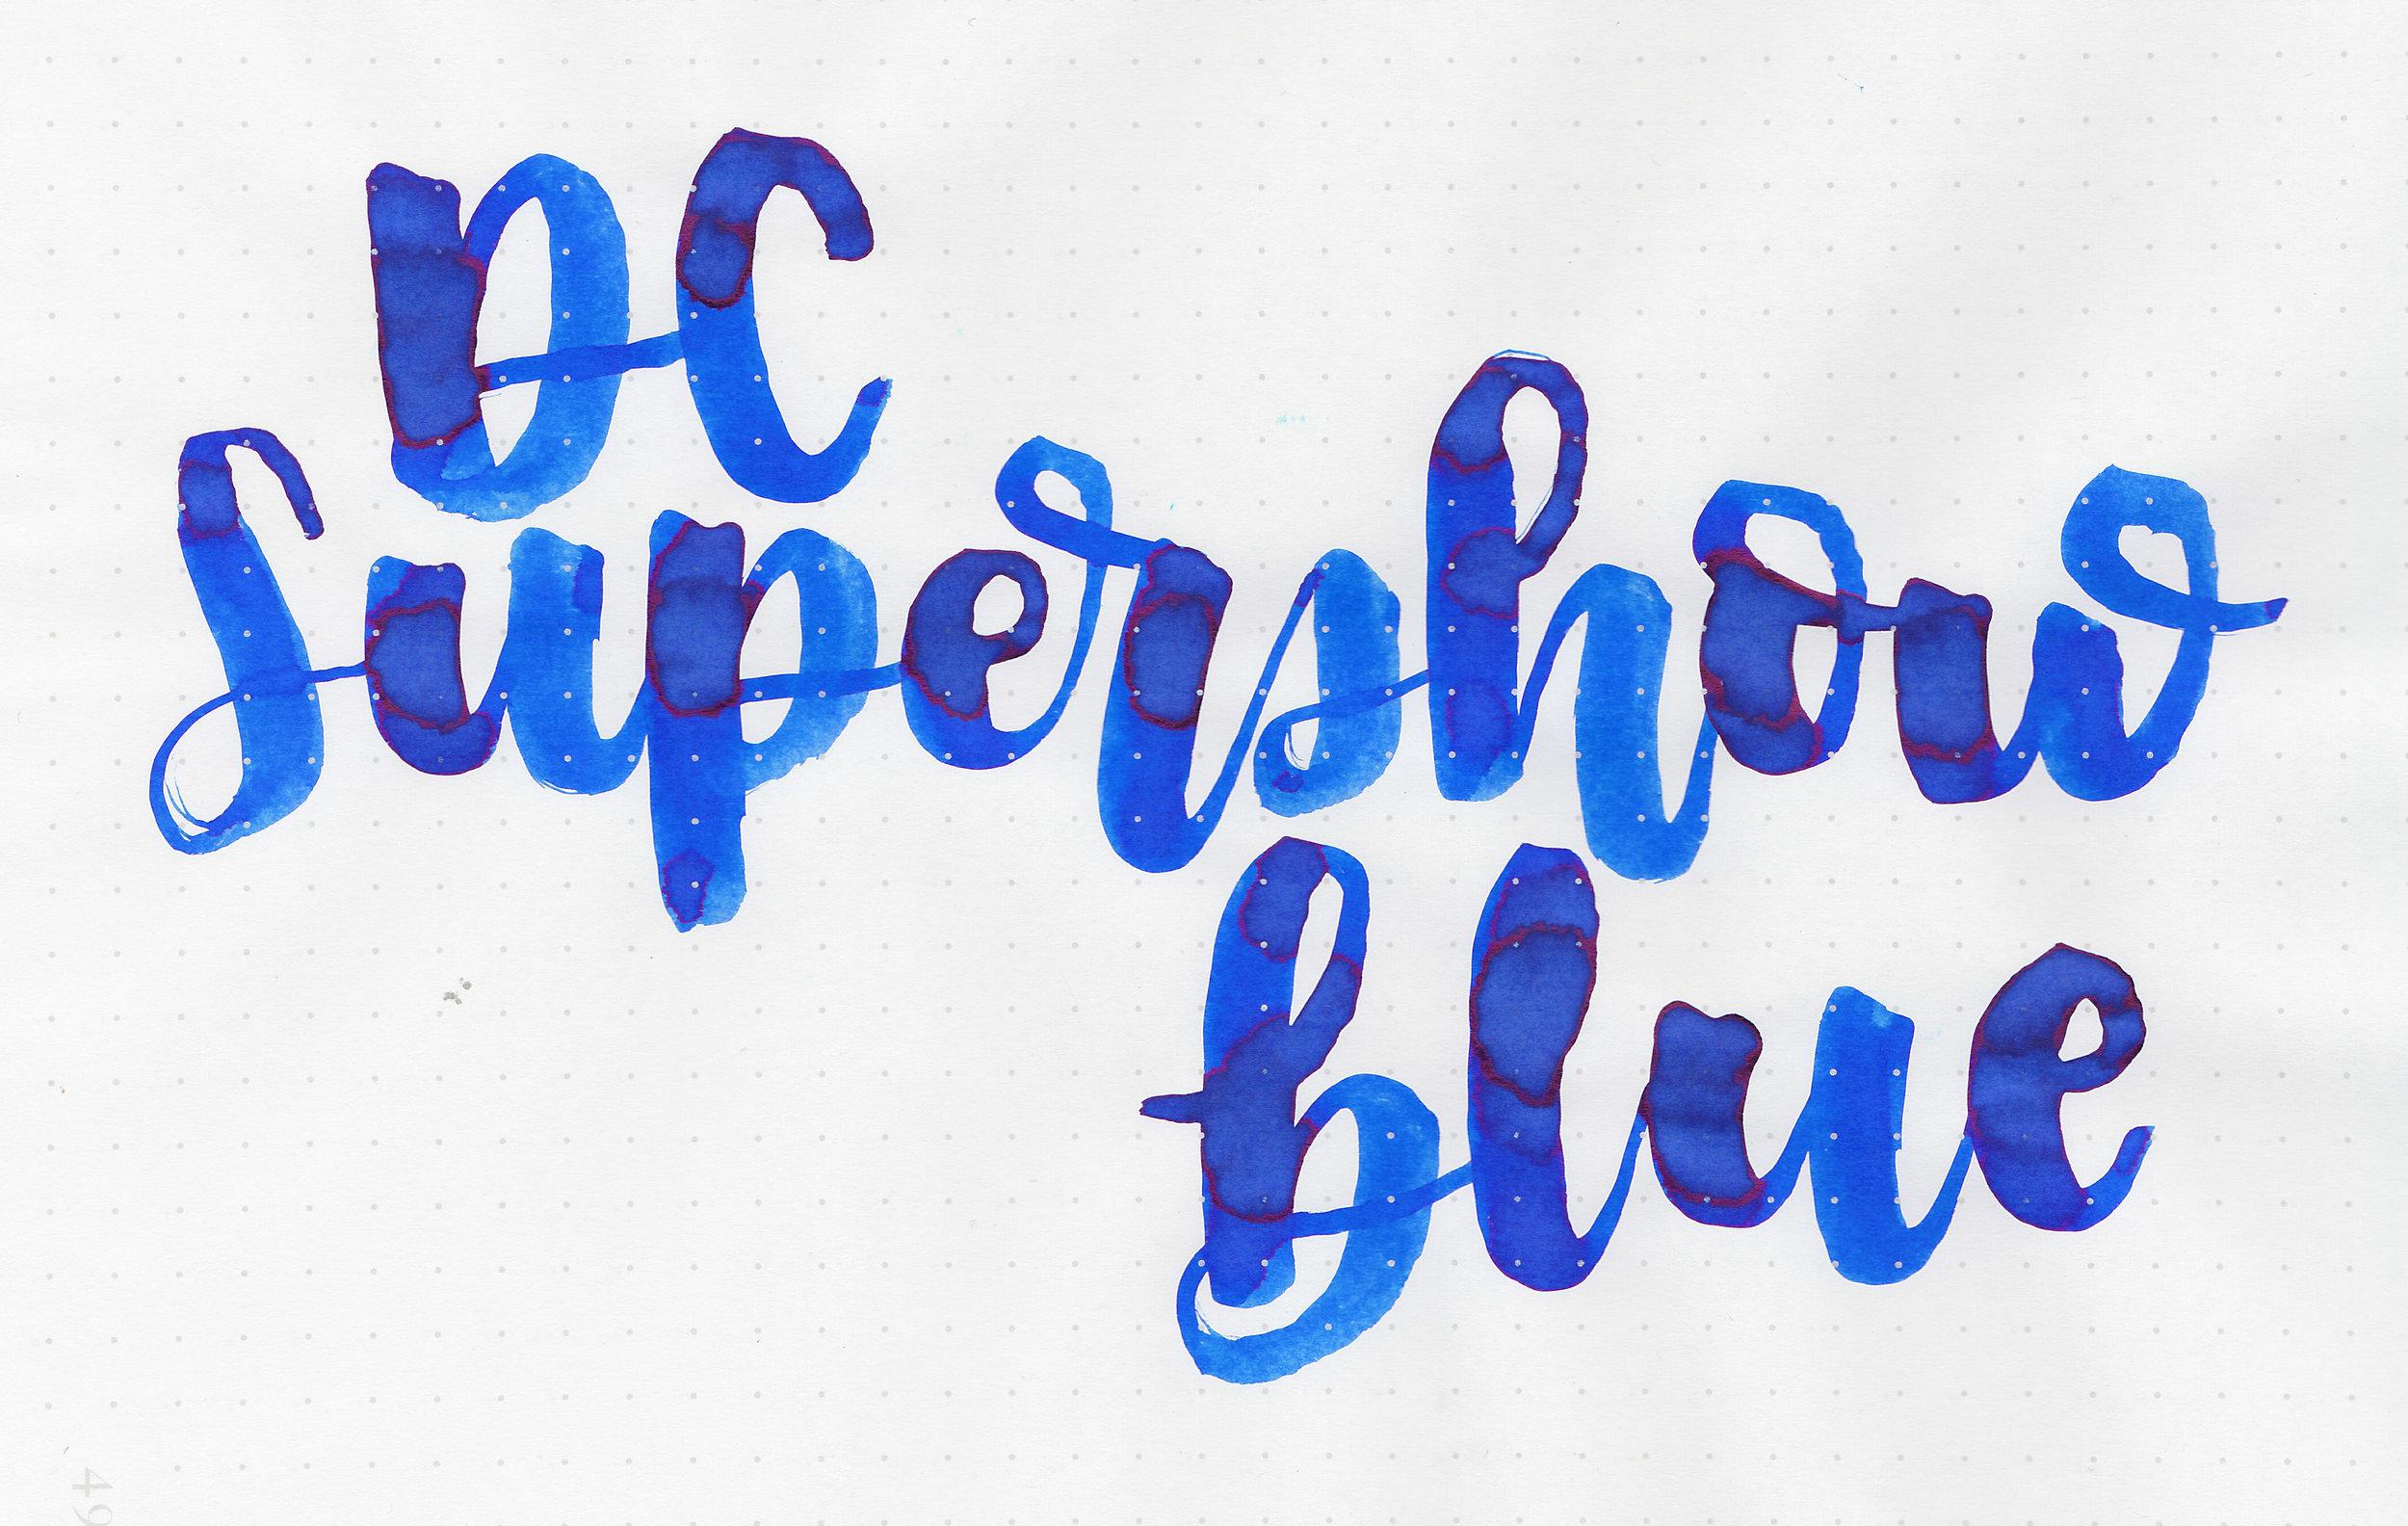 mv-dc-supershow-2.jpg